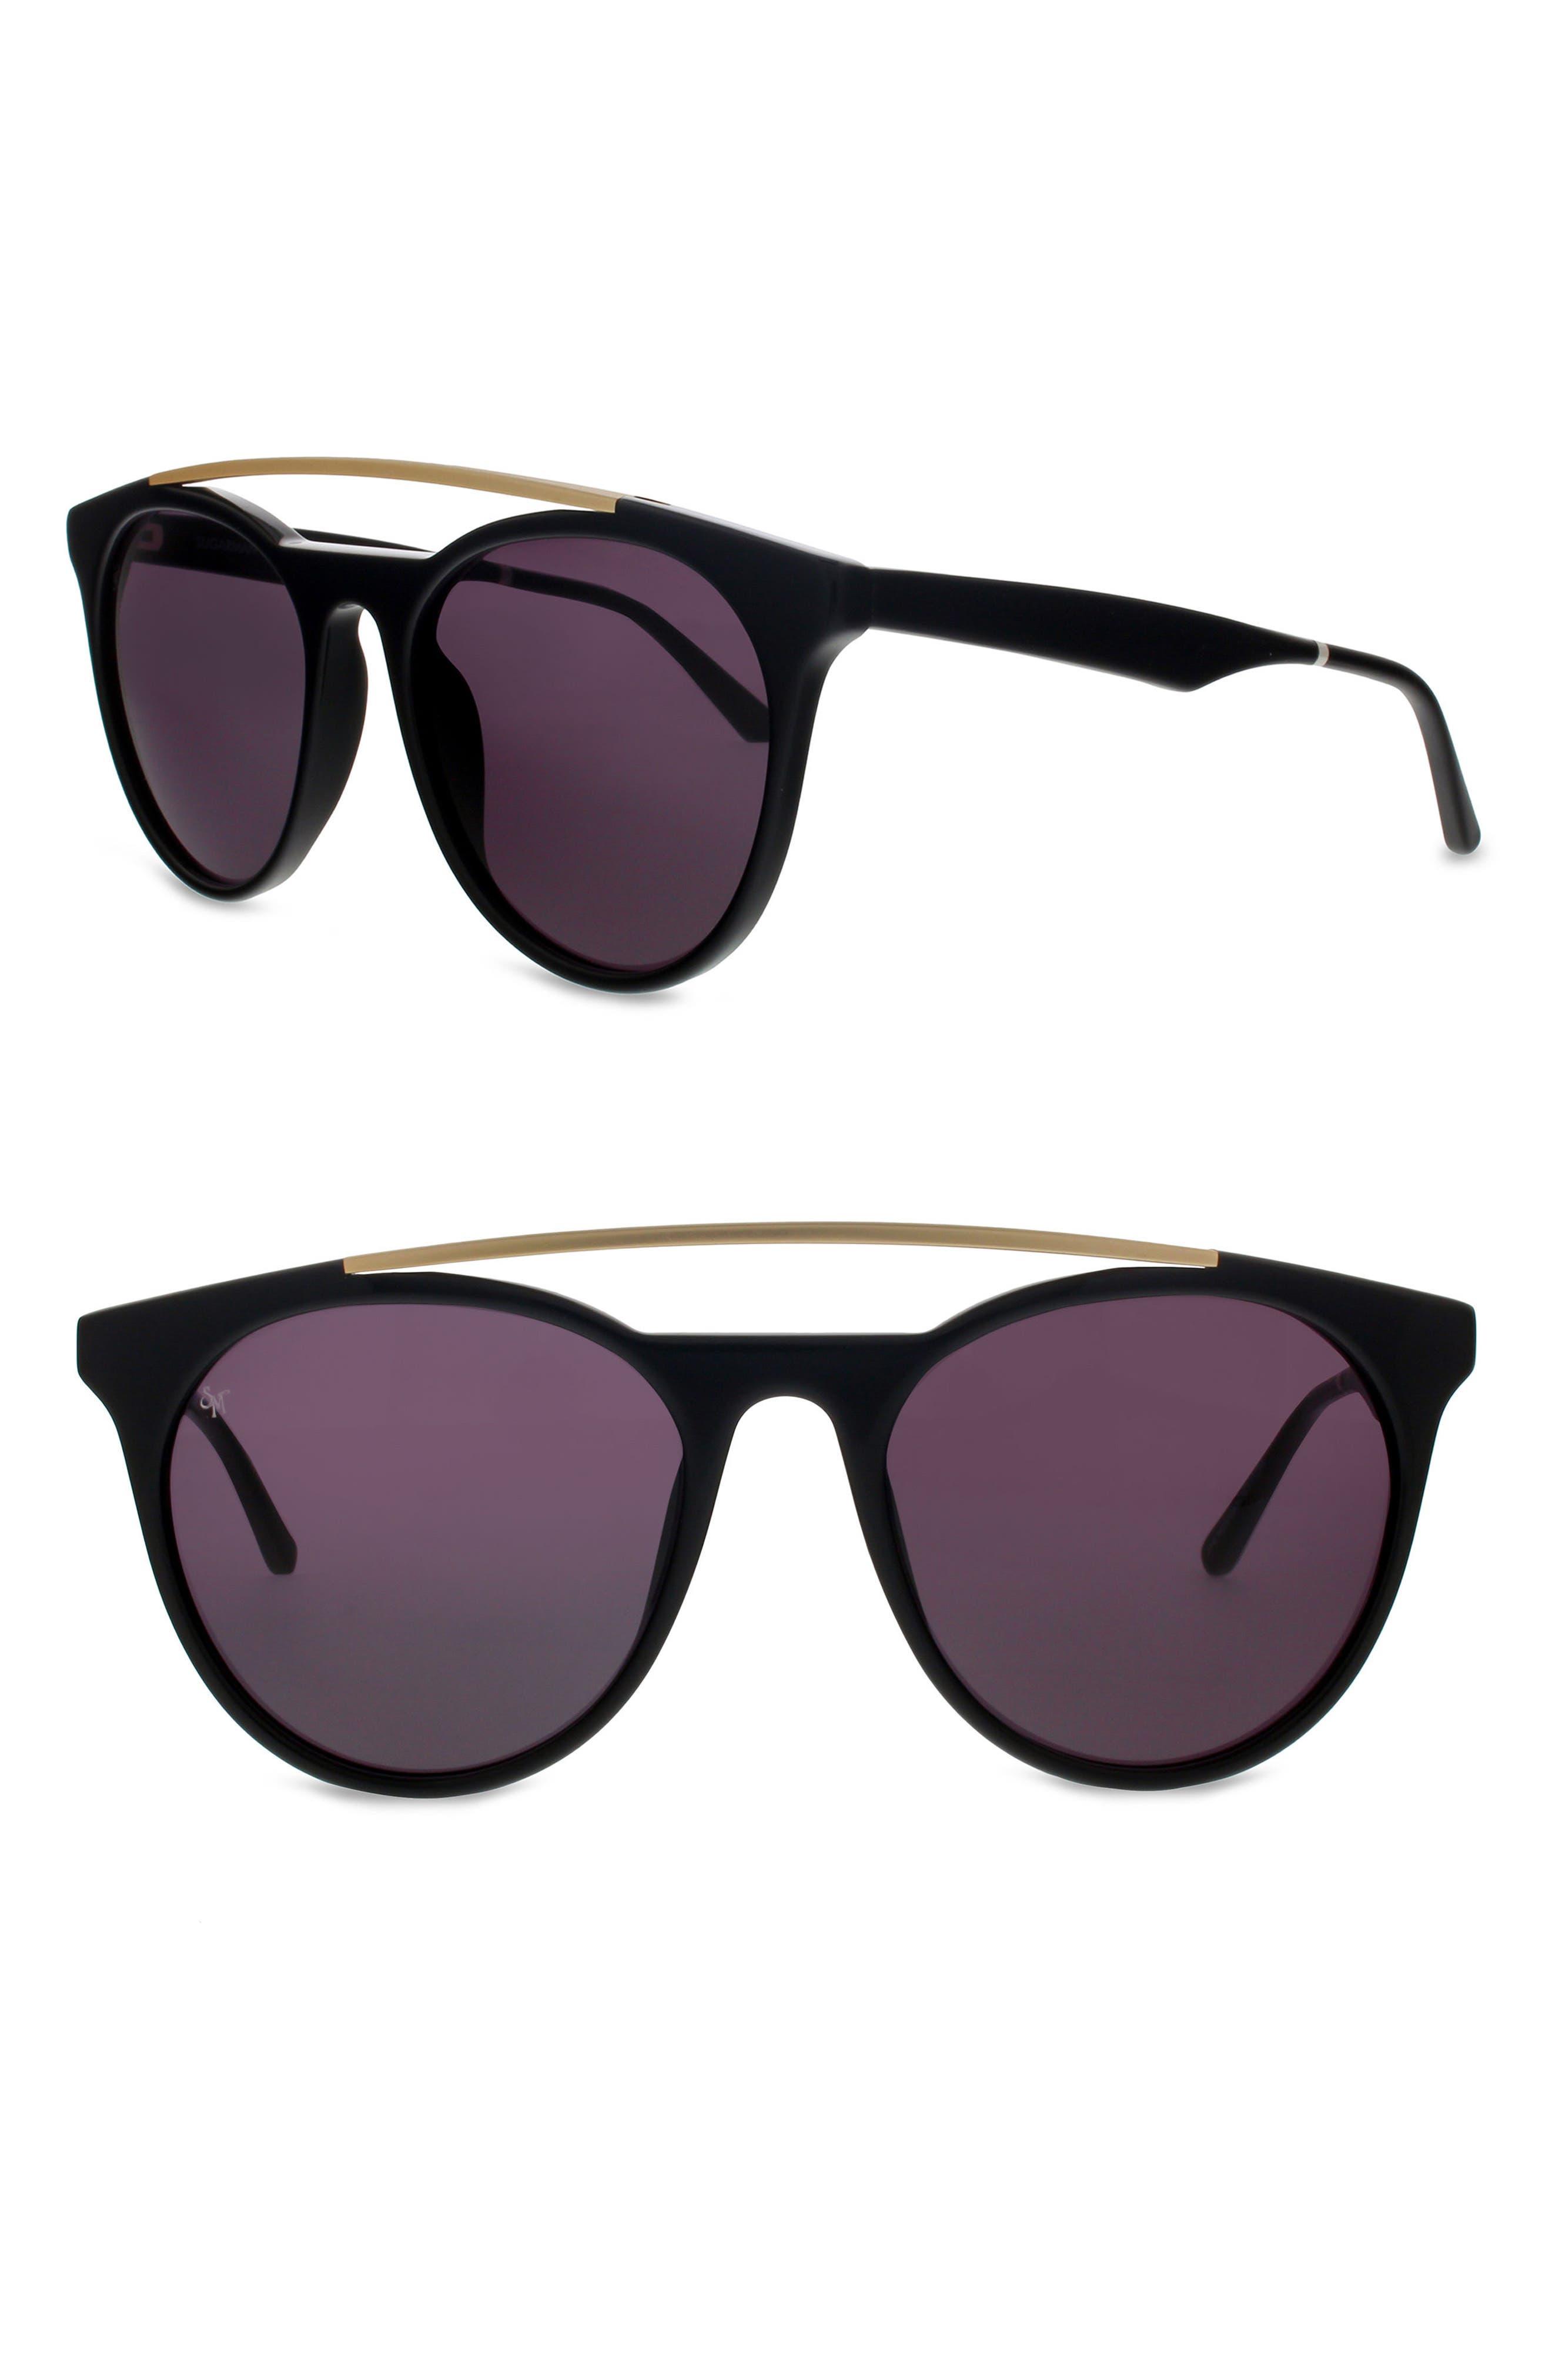 Sugarman 52mm Round Sunglasses,                             Main thumbnail 1, color,                             Black/ Matte Gold